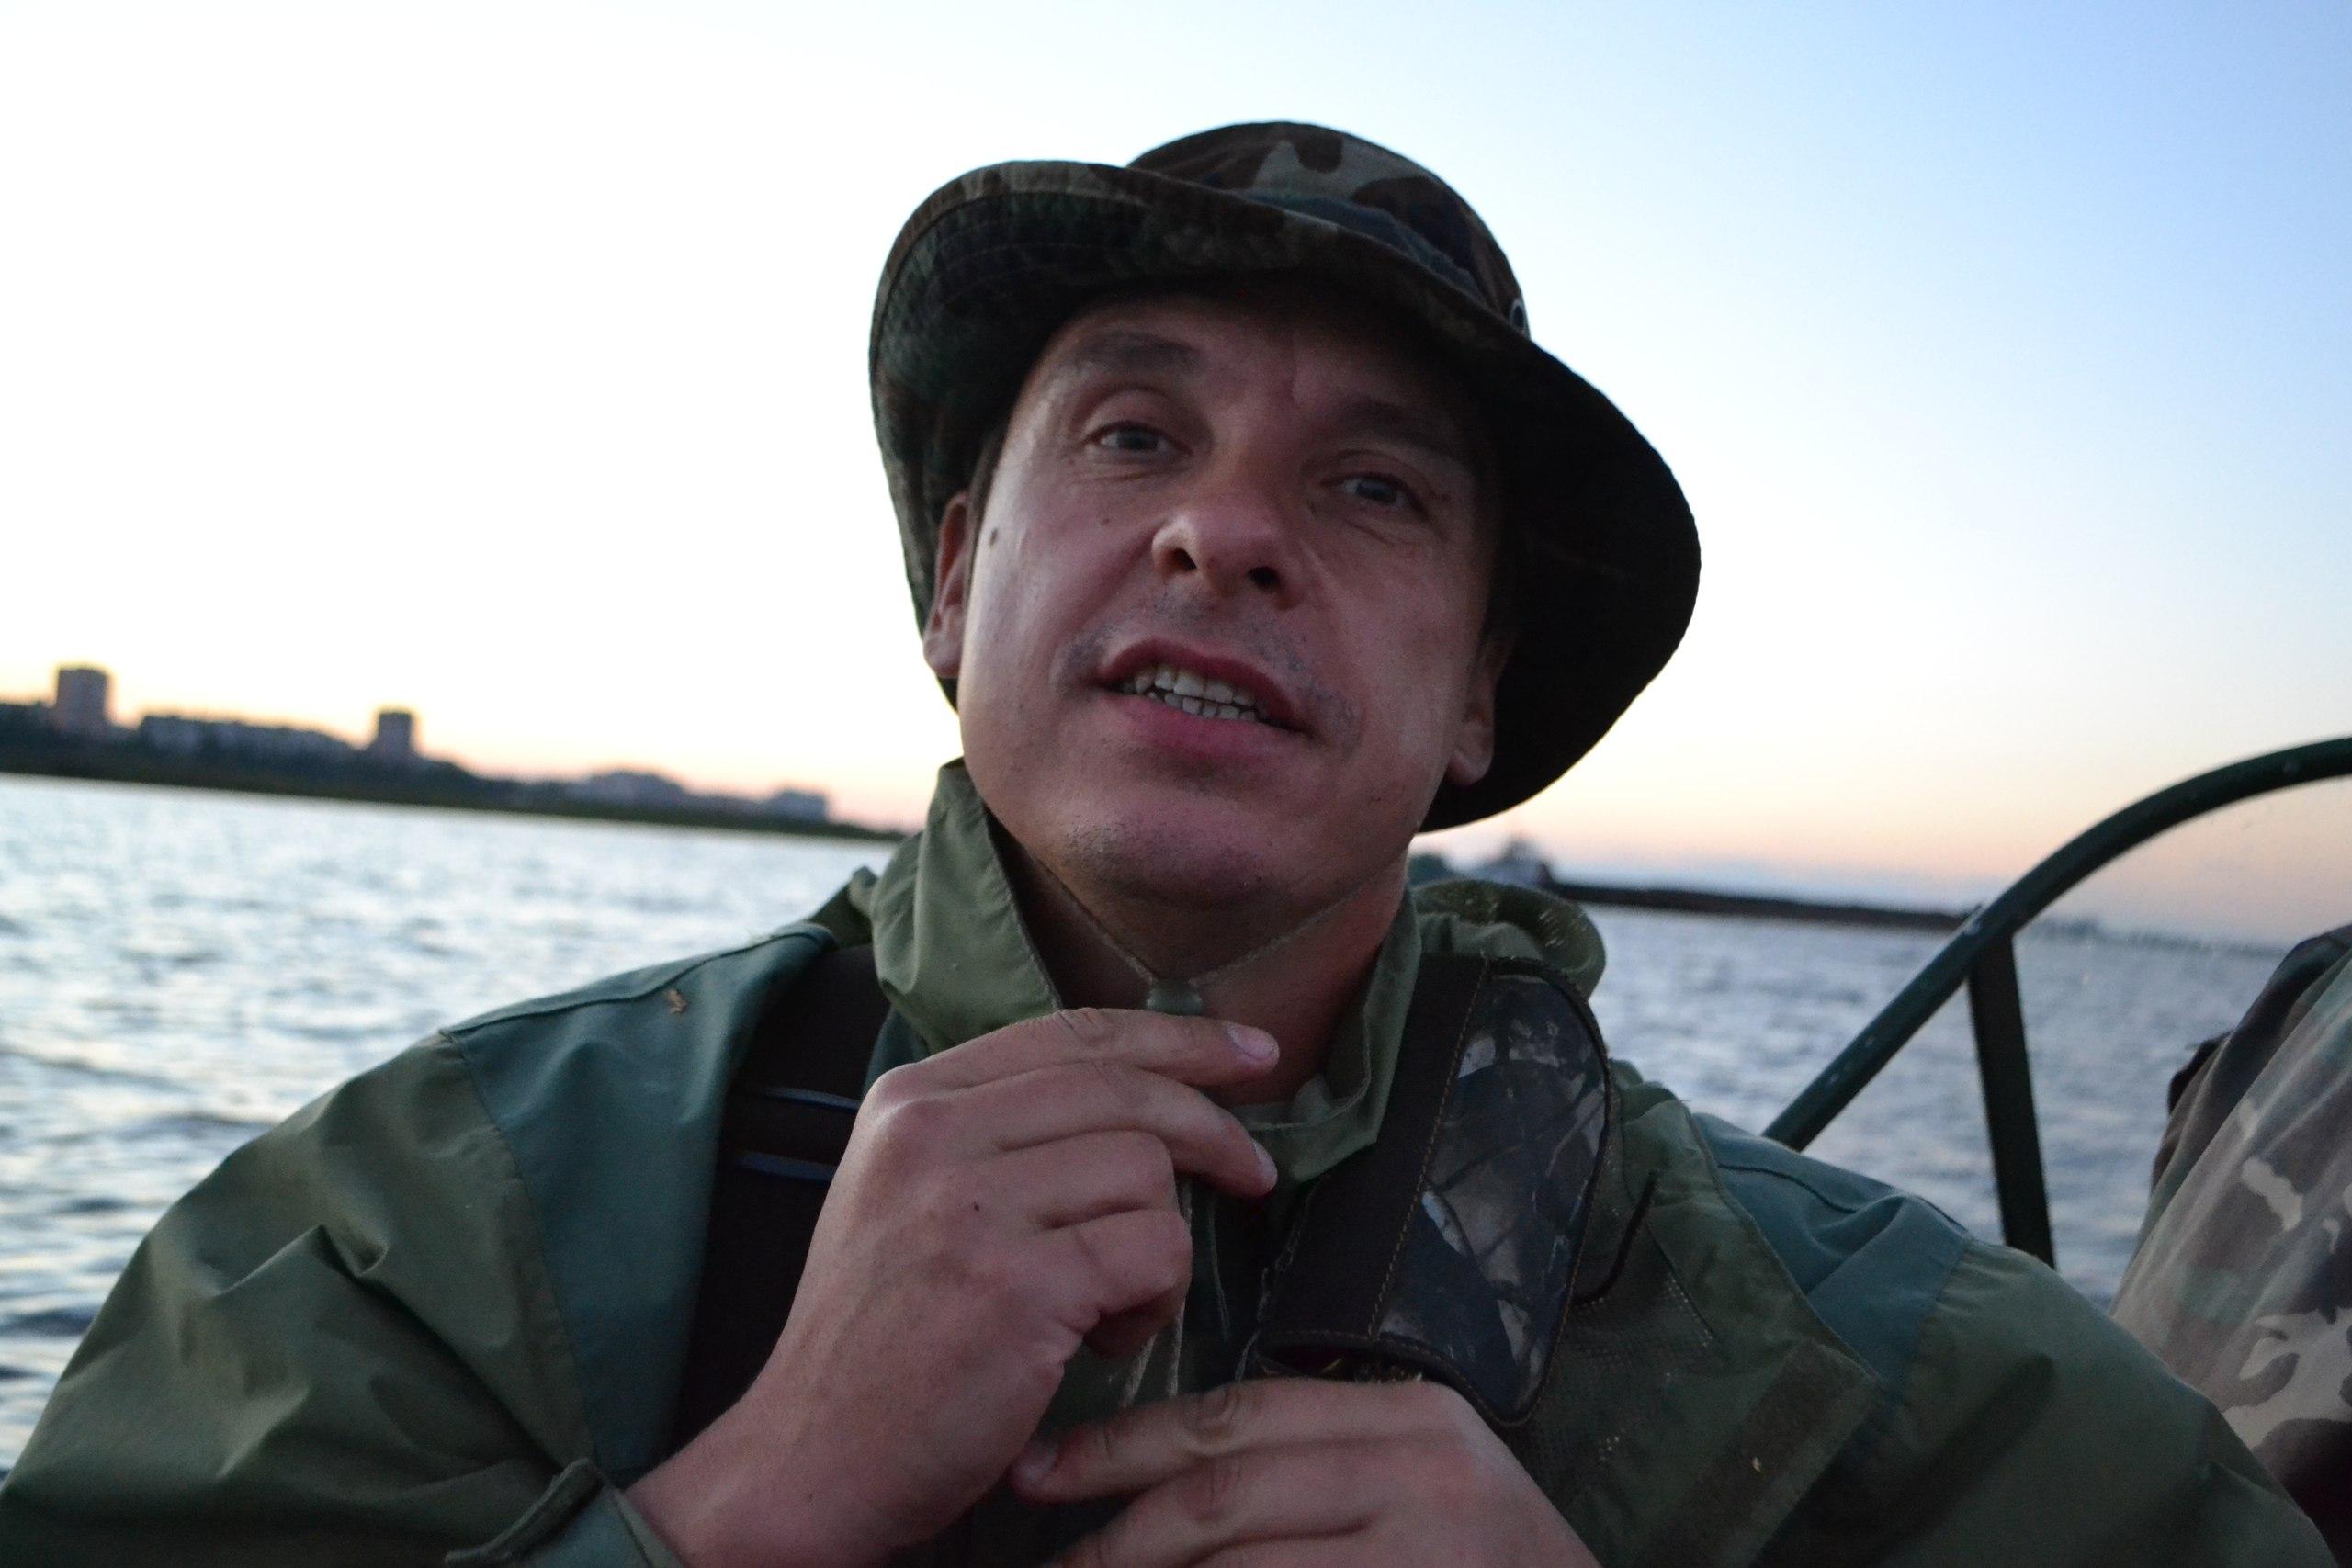 Елена Руденко Охота на водоплавающую дичь ( Украинка. 24-25 августа. 2016 г.) - Страница 2 Az9fYevhp2w